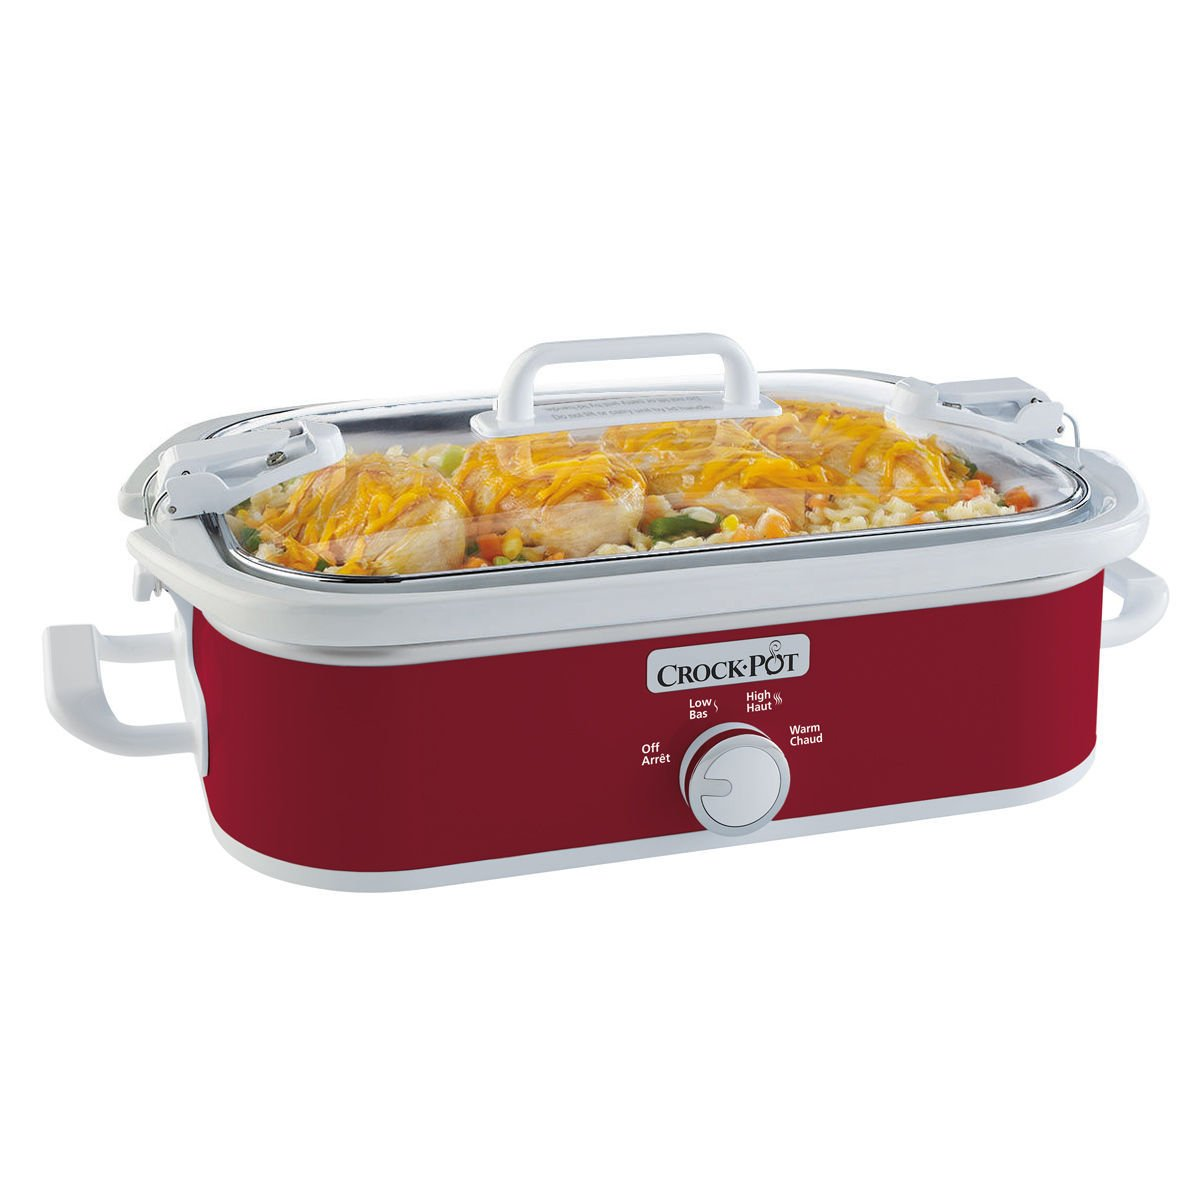 Crockpot Casserole Crock Slow Cooker SCCPCCM350-R-033